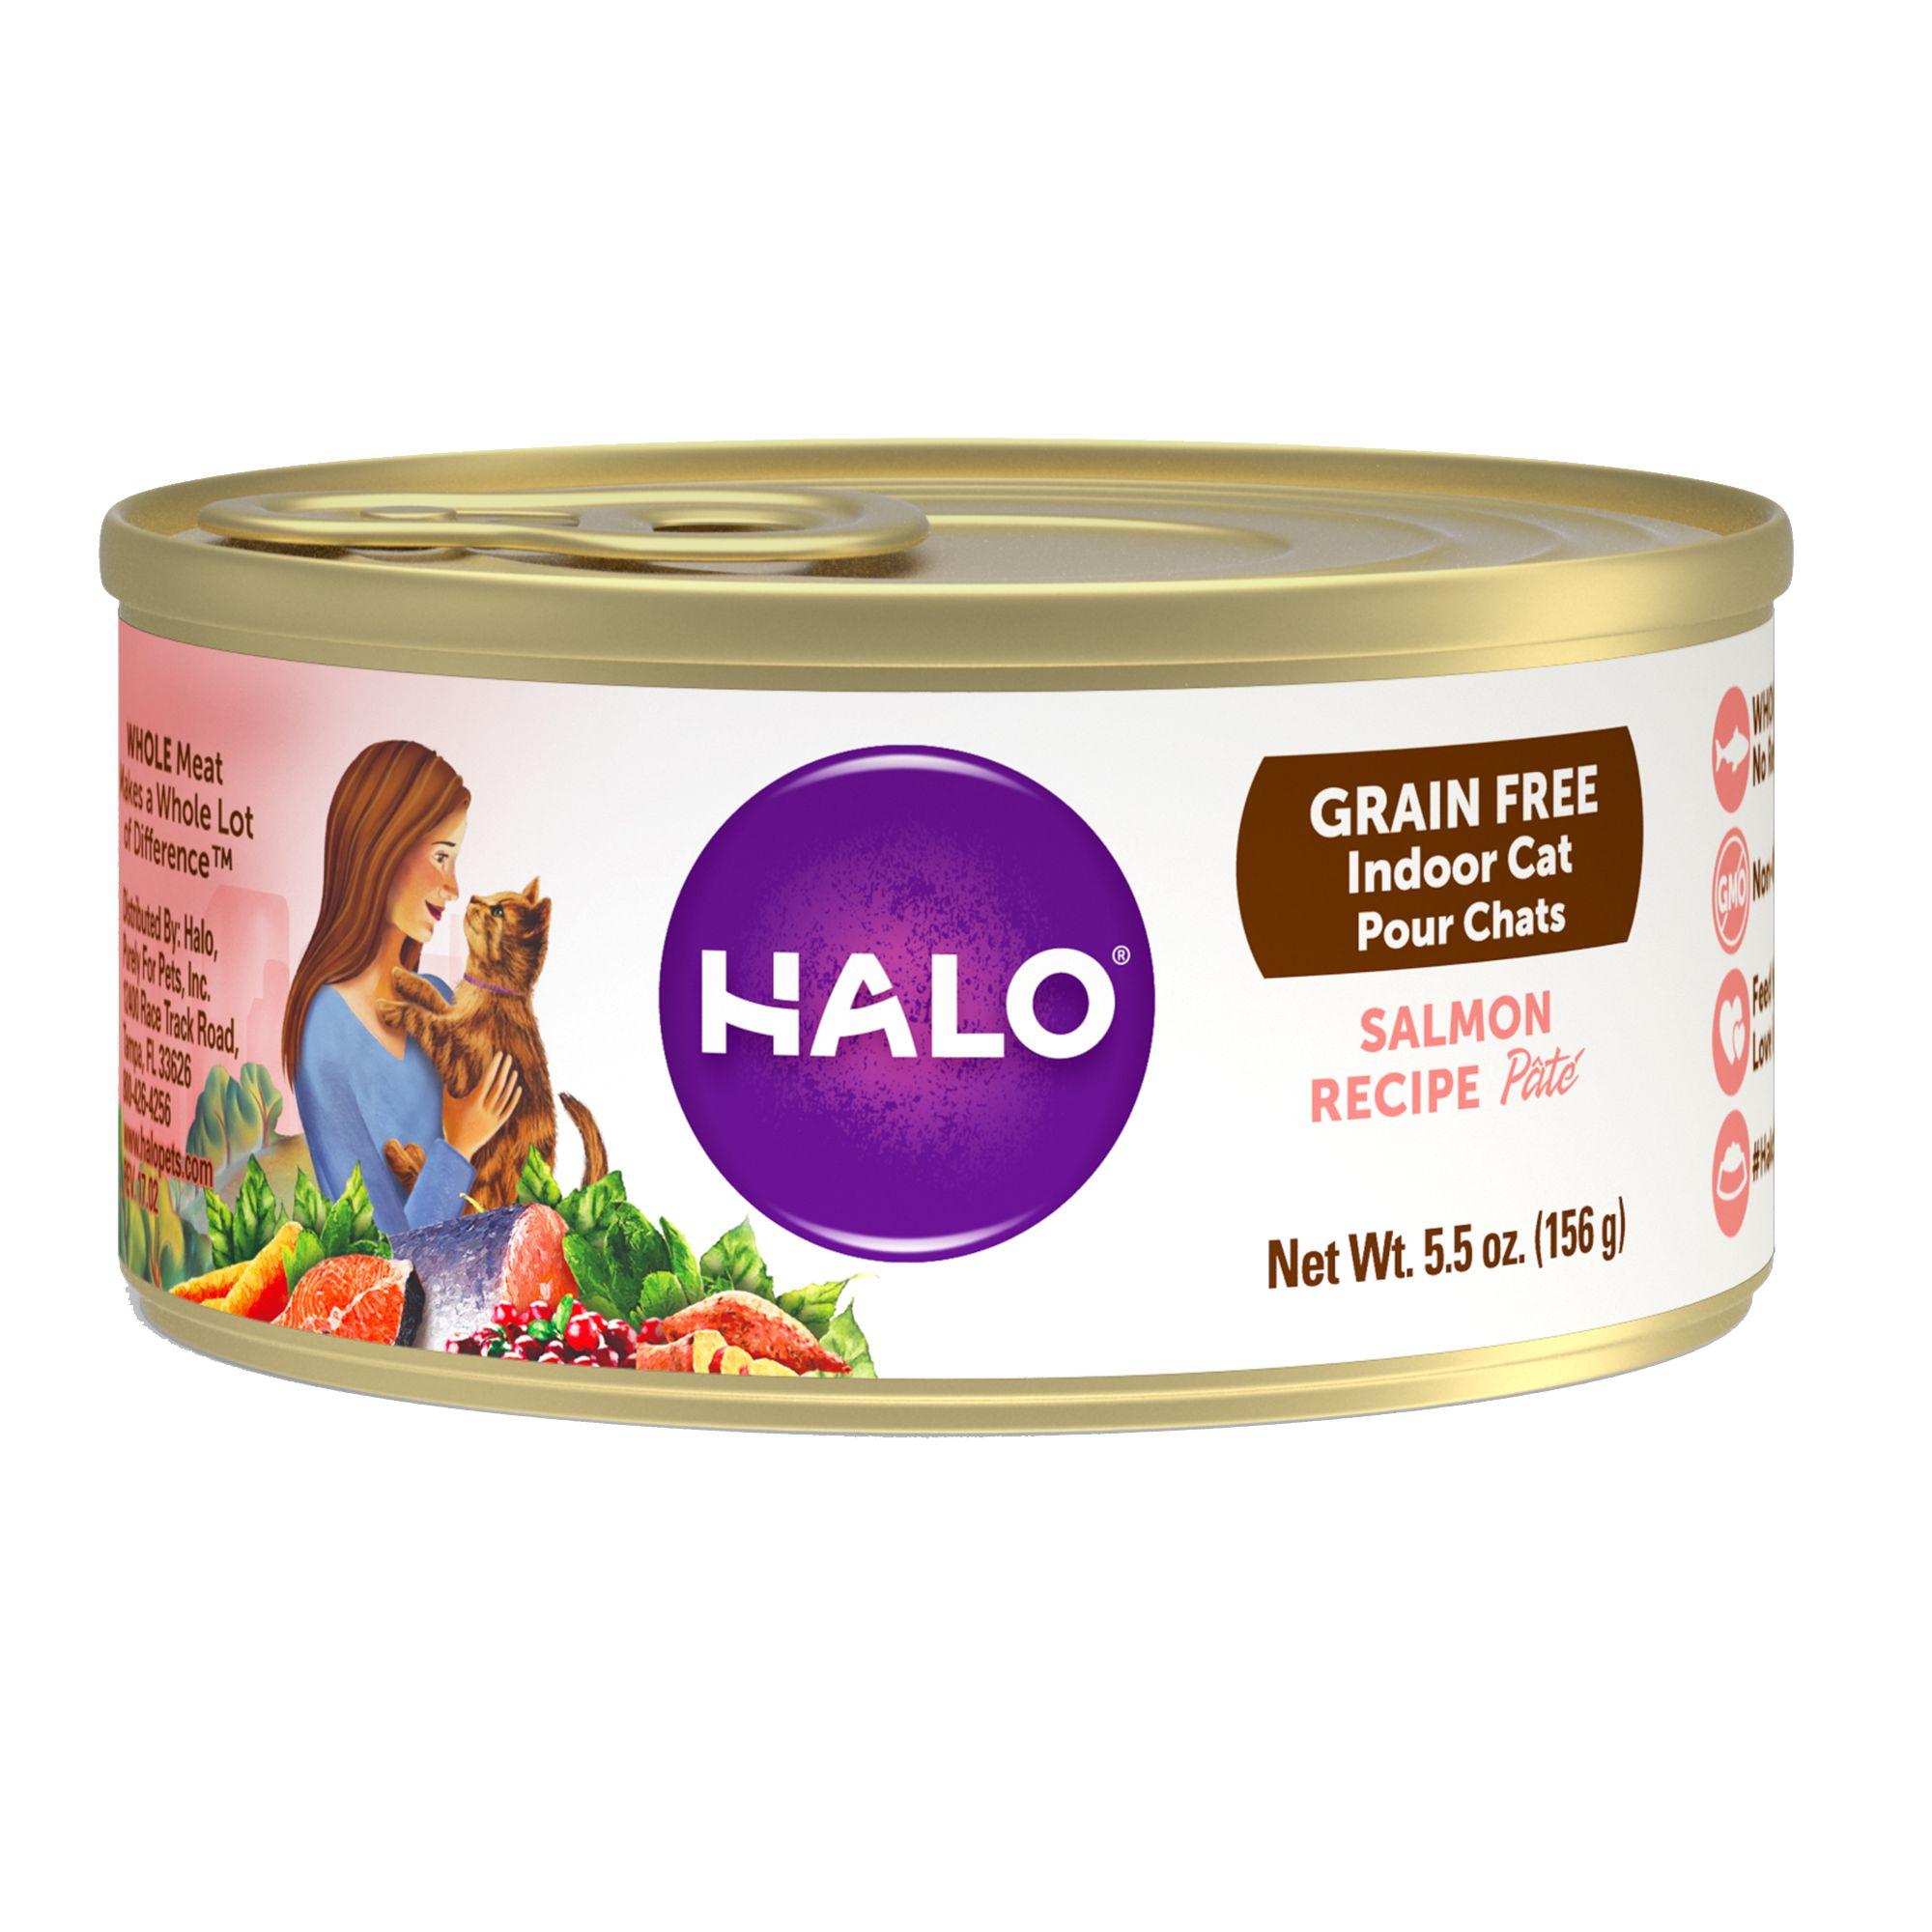 Halo indoor cat food natural grain free salmon recipe